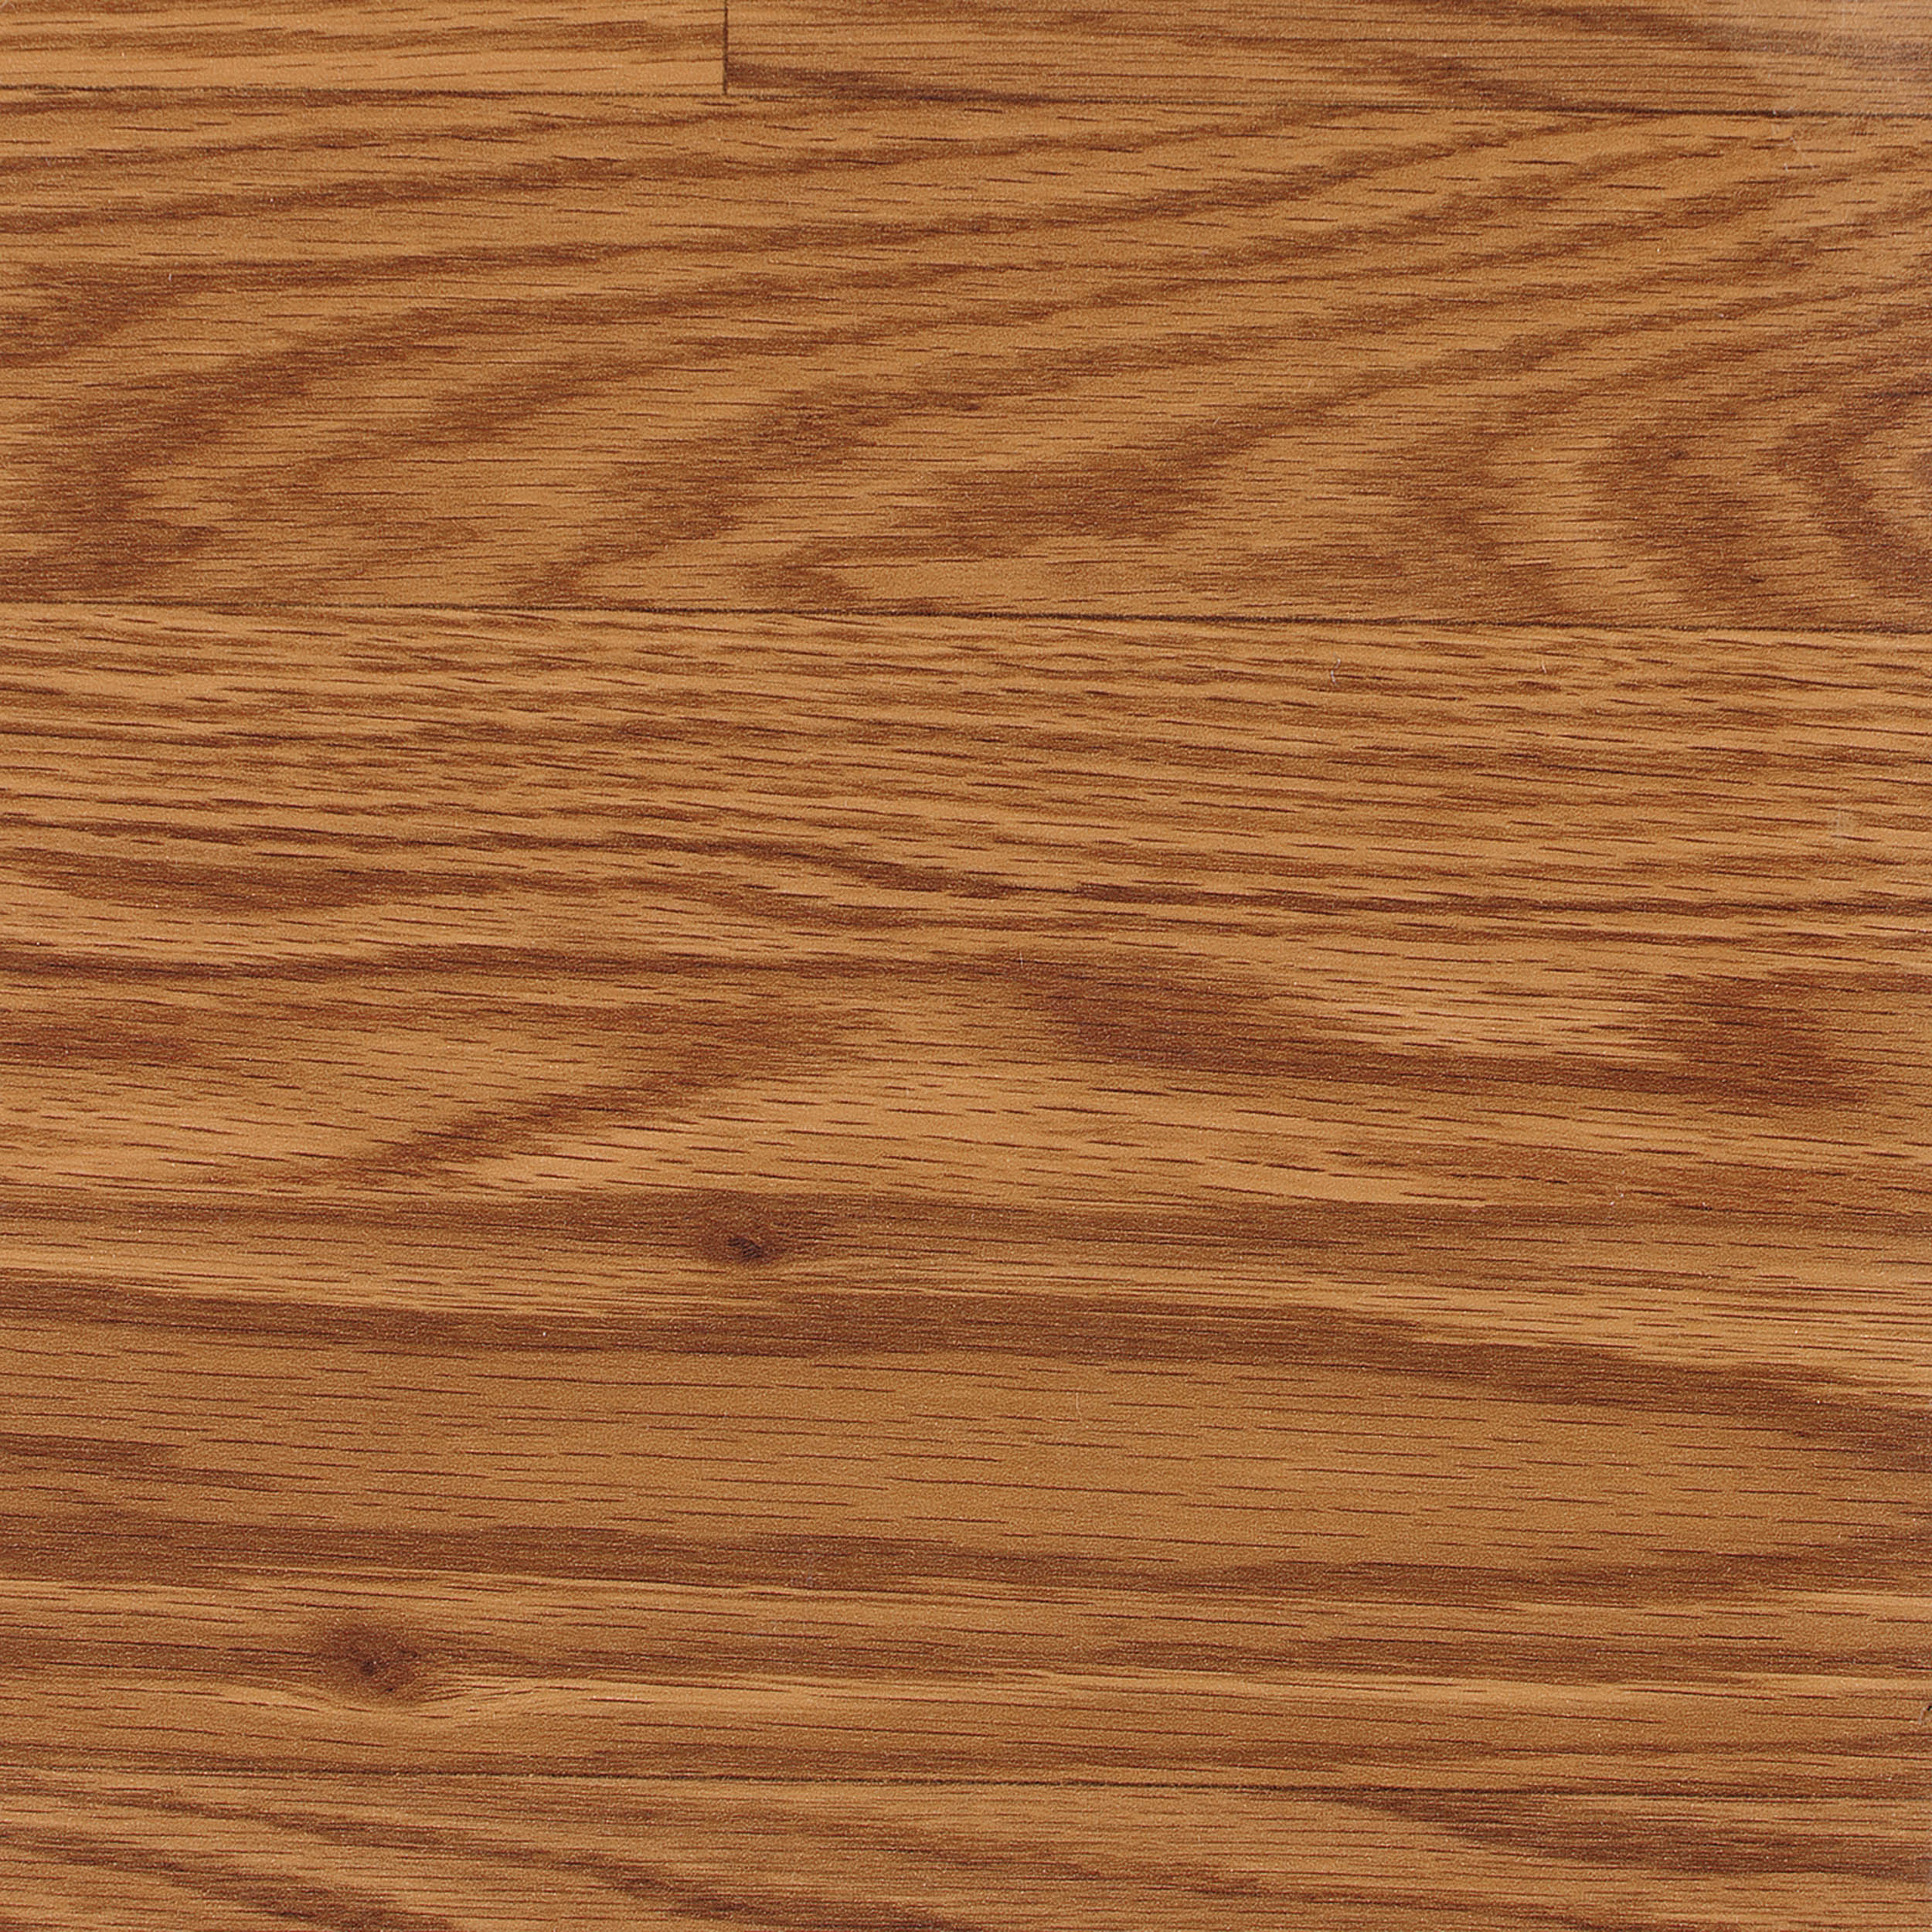 Easy Install 8mm 3-Strip Gunstock Oak Laminate Flooring (120.25 SF